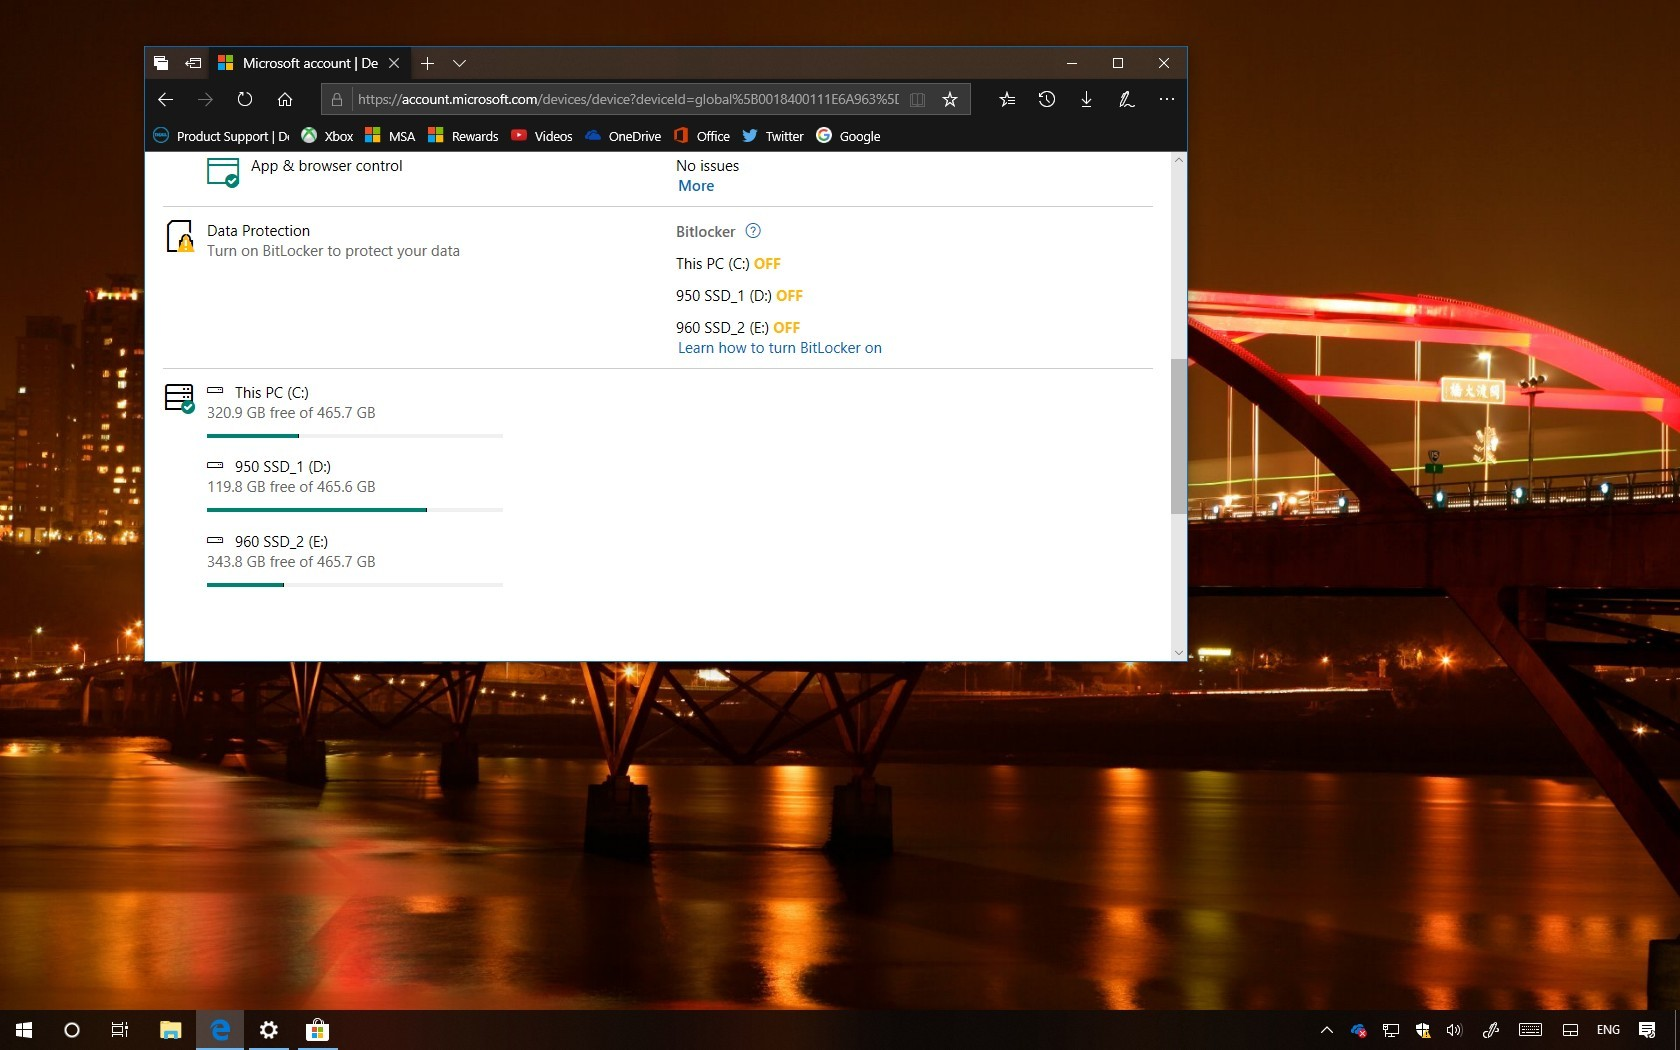 Windows 10 hard drive usage using a Microsoft account